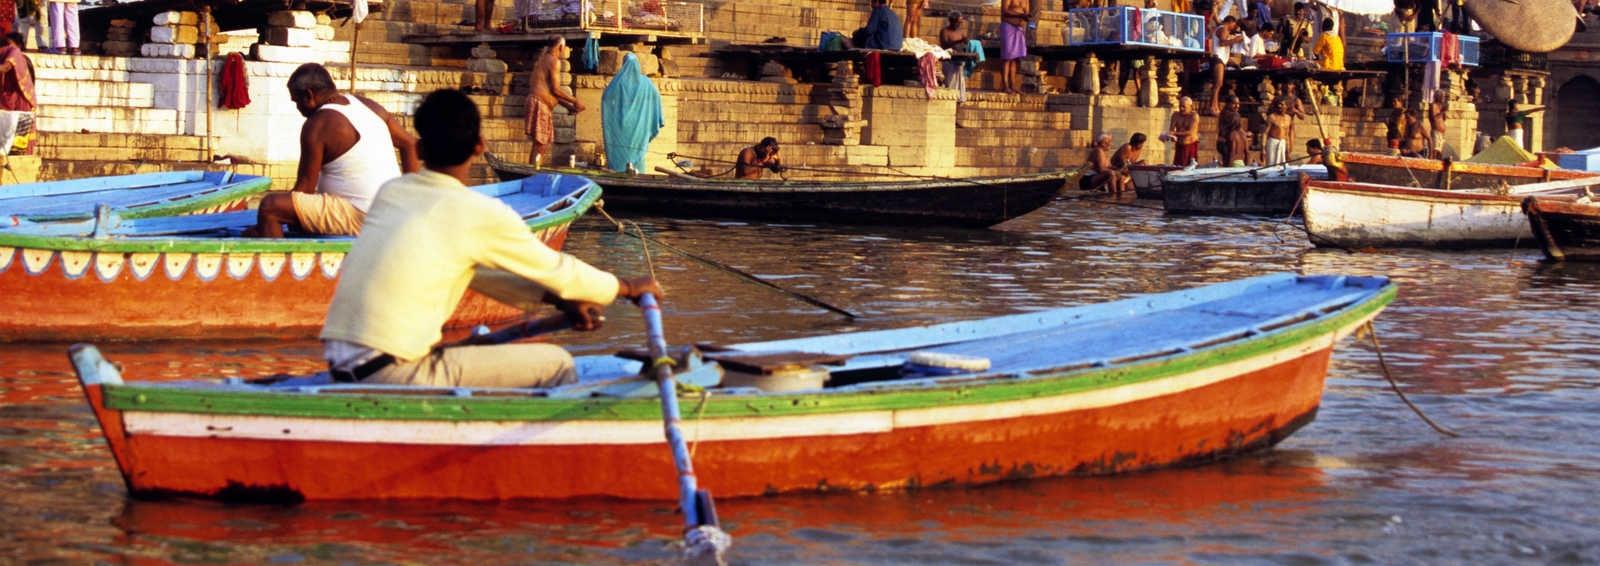 Life on The Ganges, Varanasi, India